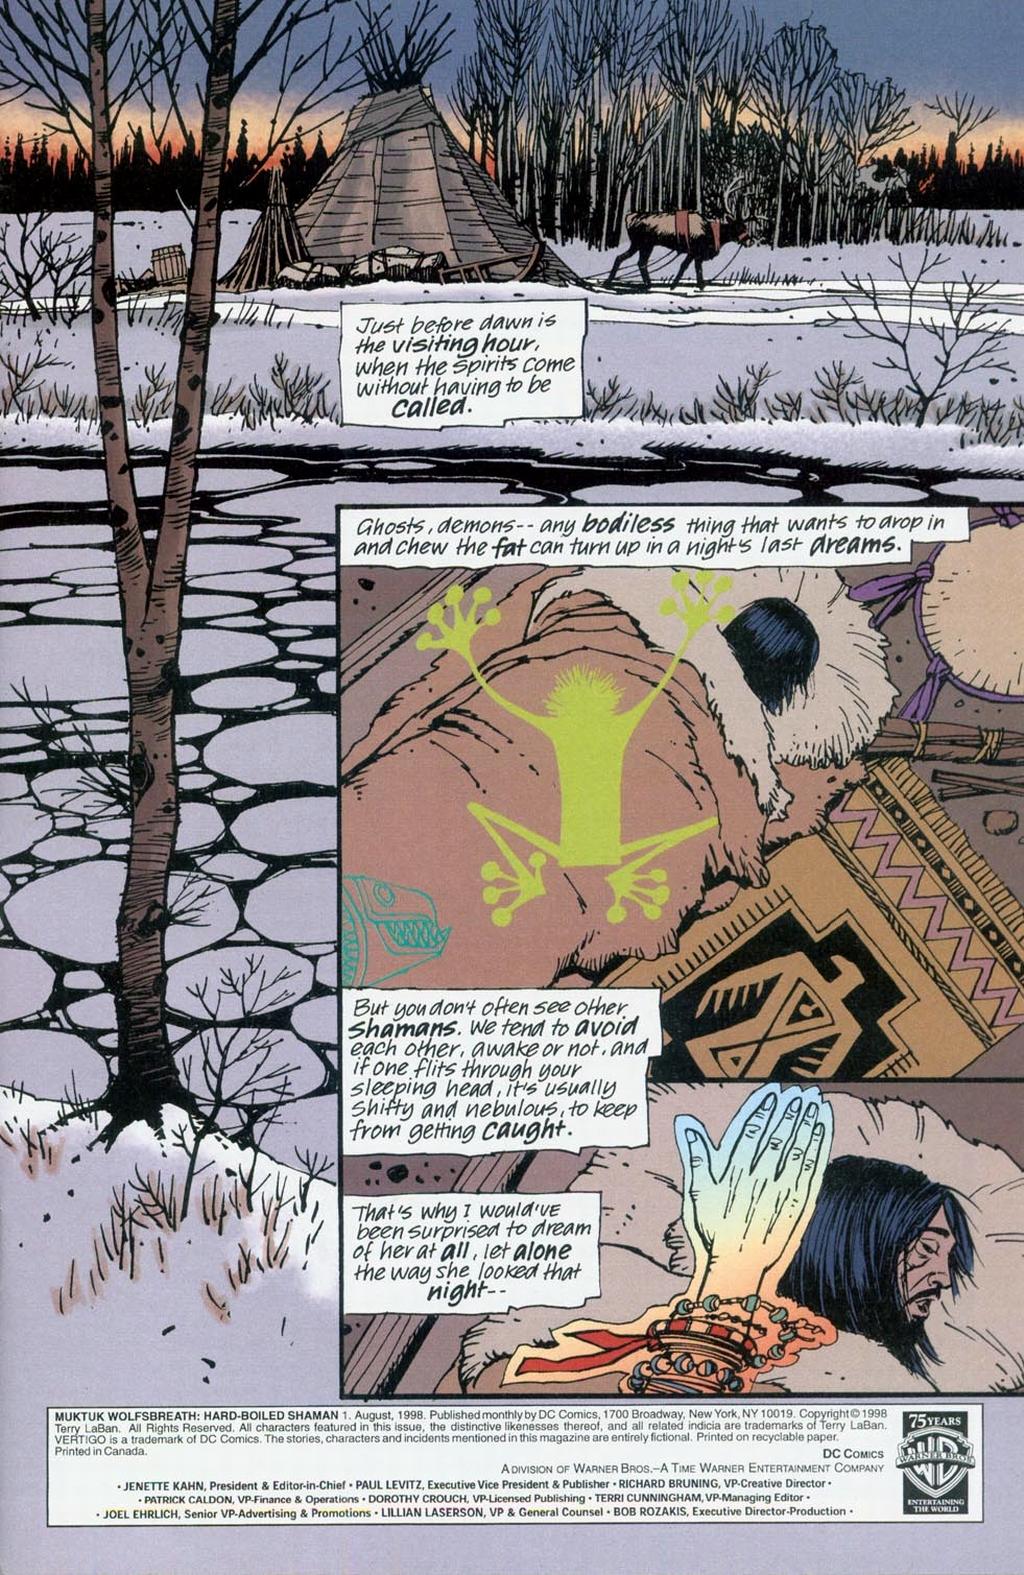 Muktuk Wolfsbreath: Hard-Boiled Shaman issue 1 - Page 2